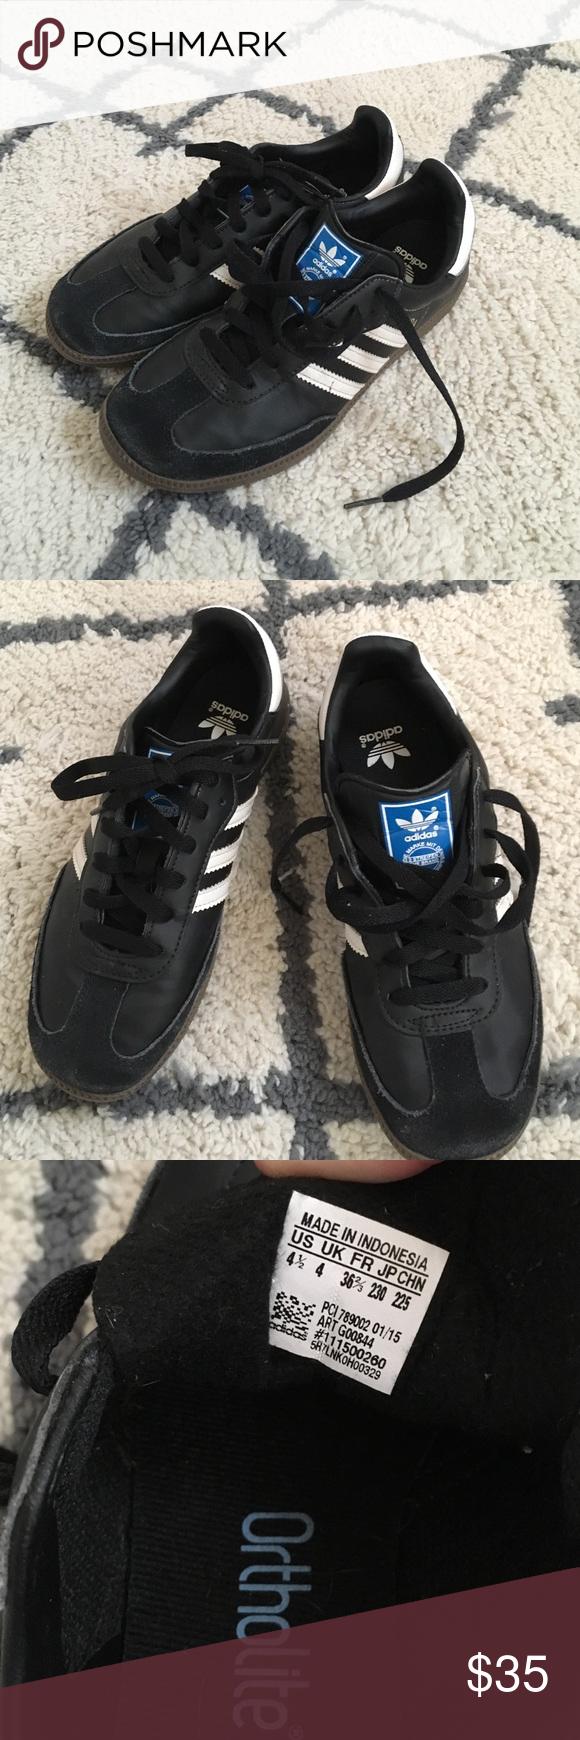 ragazzi adidas samba scarpe indoor soccer, scarpe e scarpe da ginnastica